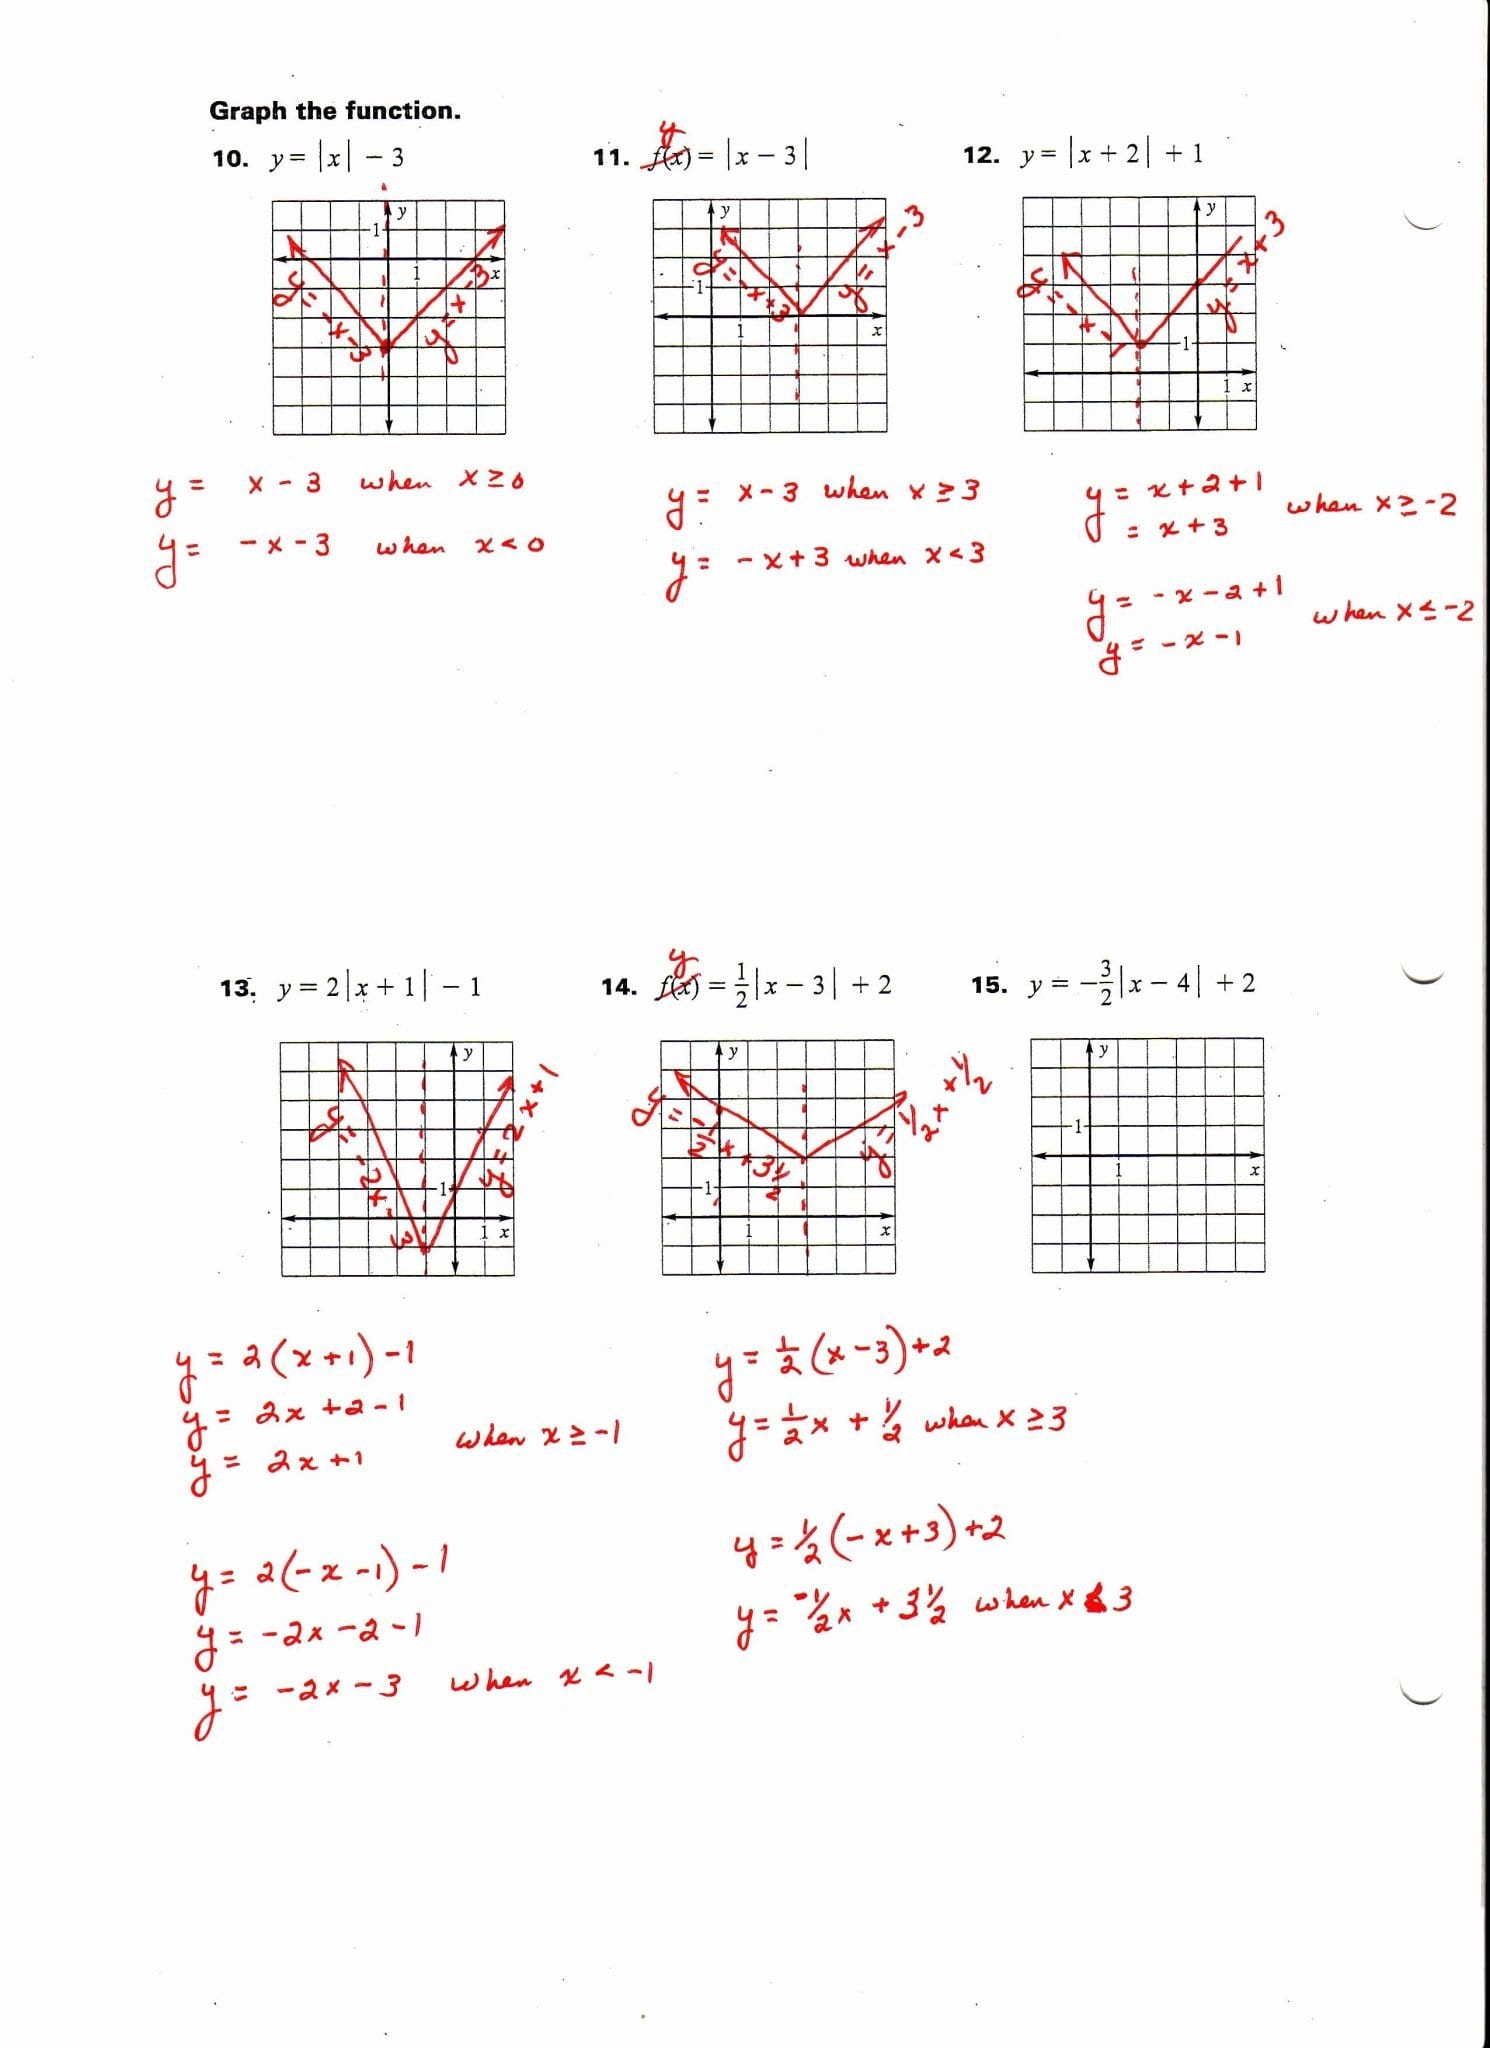 Graphing Polynomials Worksheet Algebra 2  Briefencounters Or Graphing Polynomials Worksheet Algebra 2